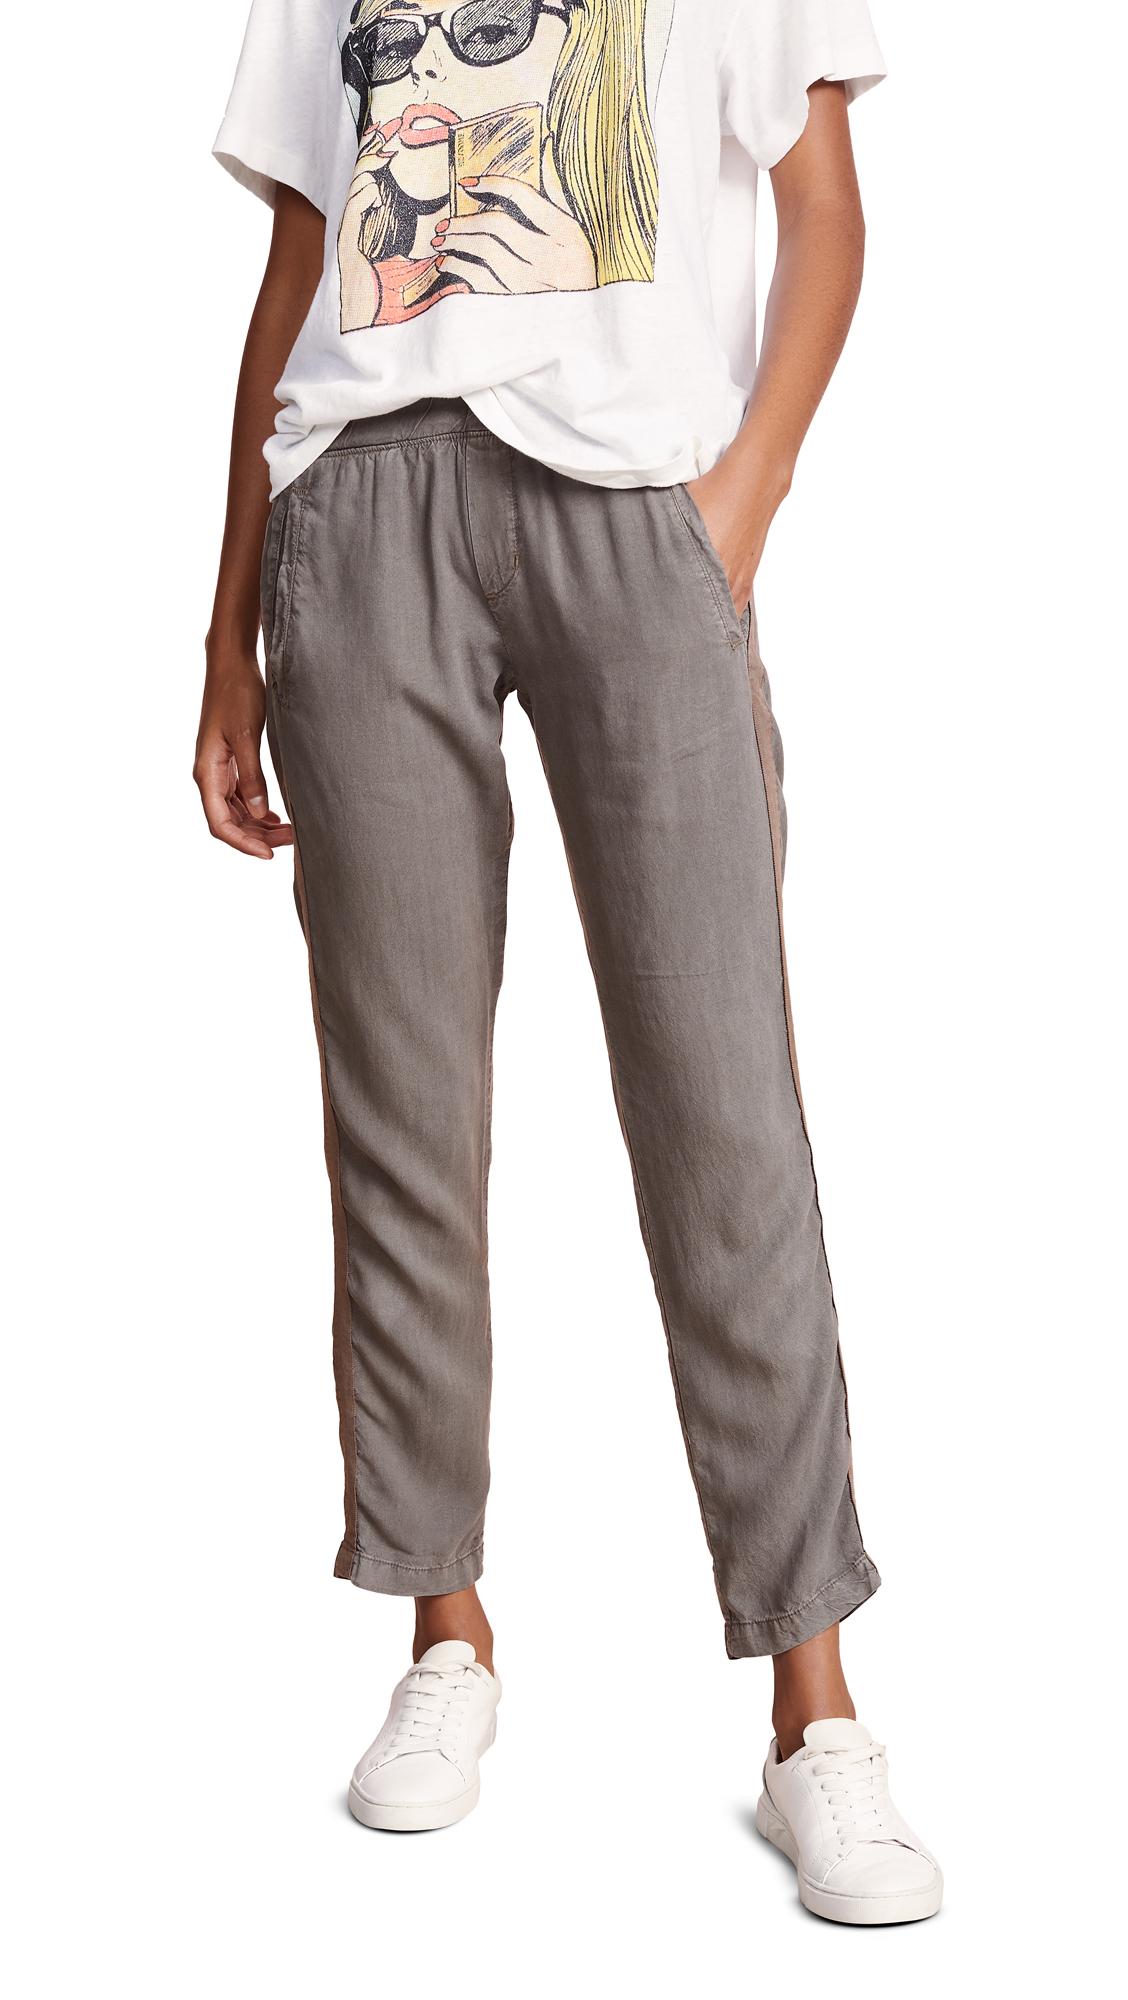 Bella Dahl Welt Pocket Trousers - Army Olive